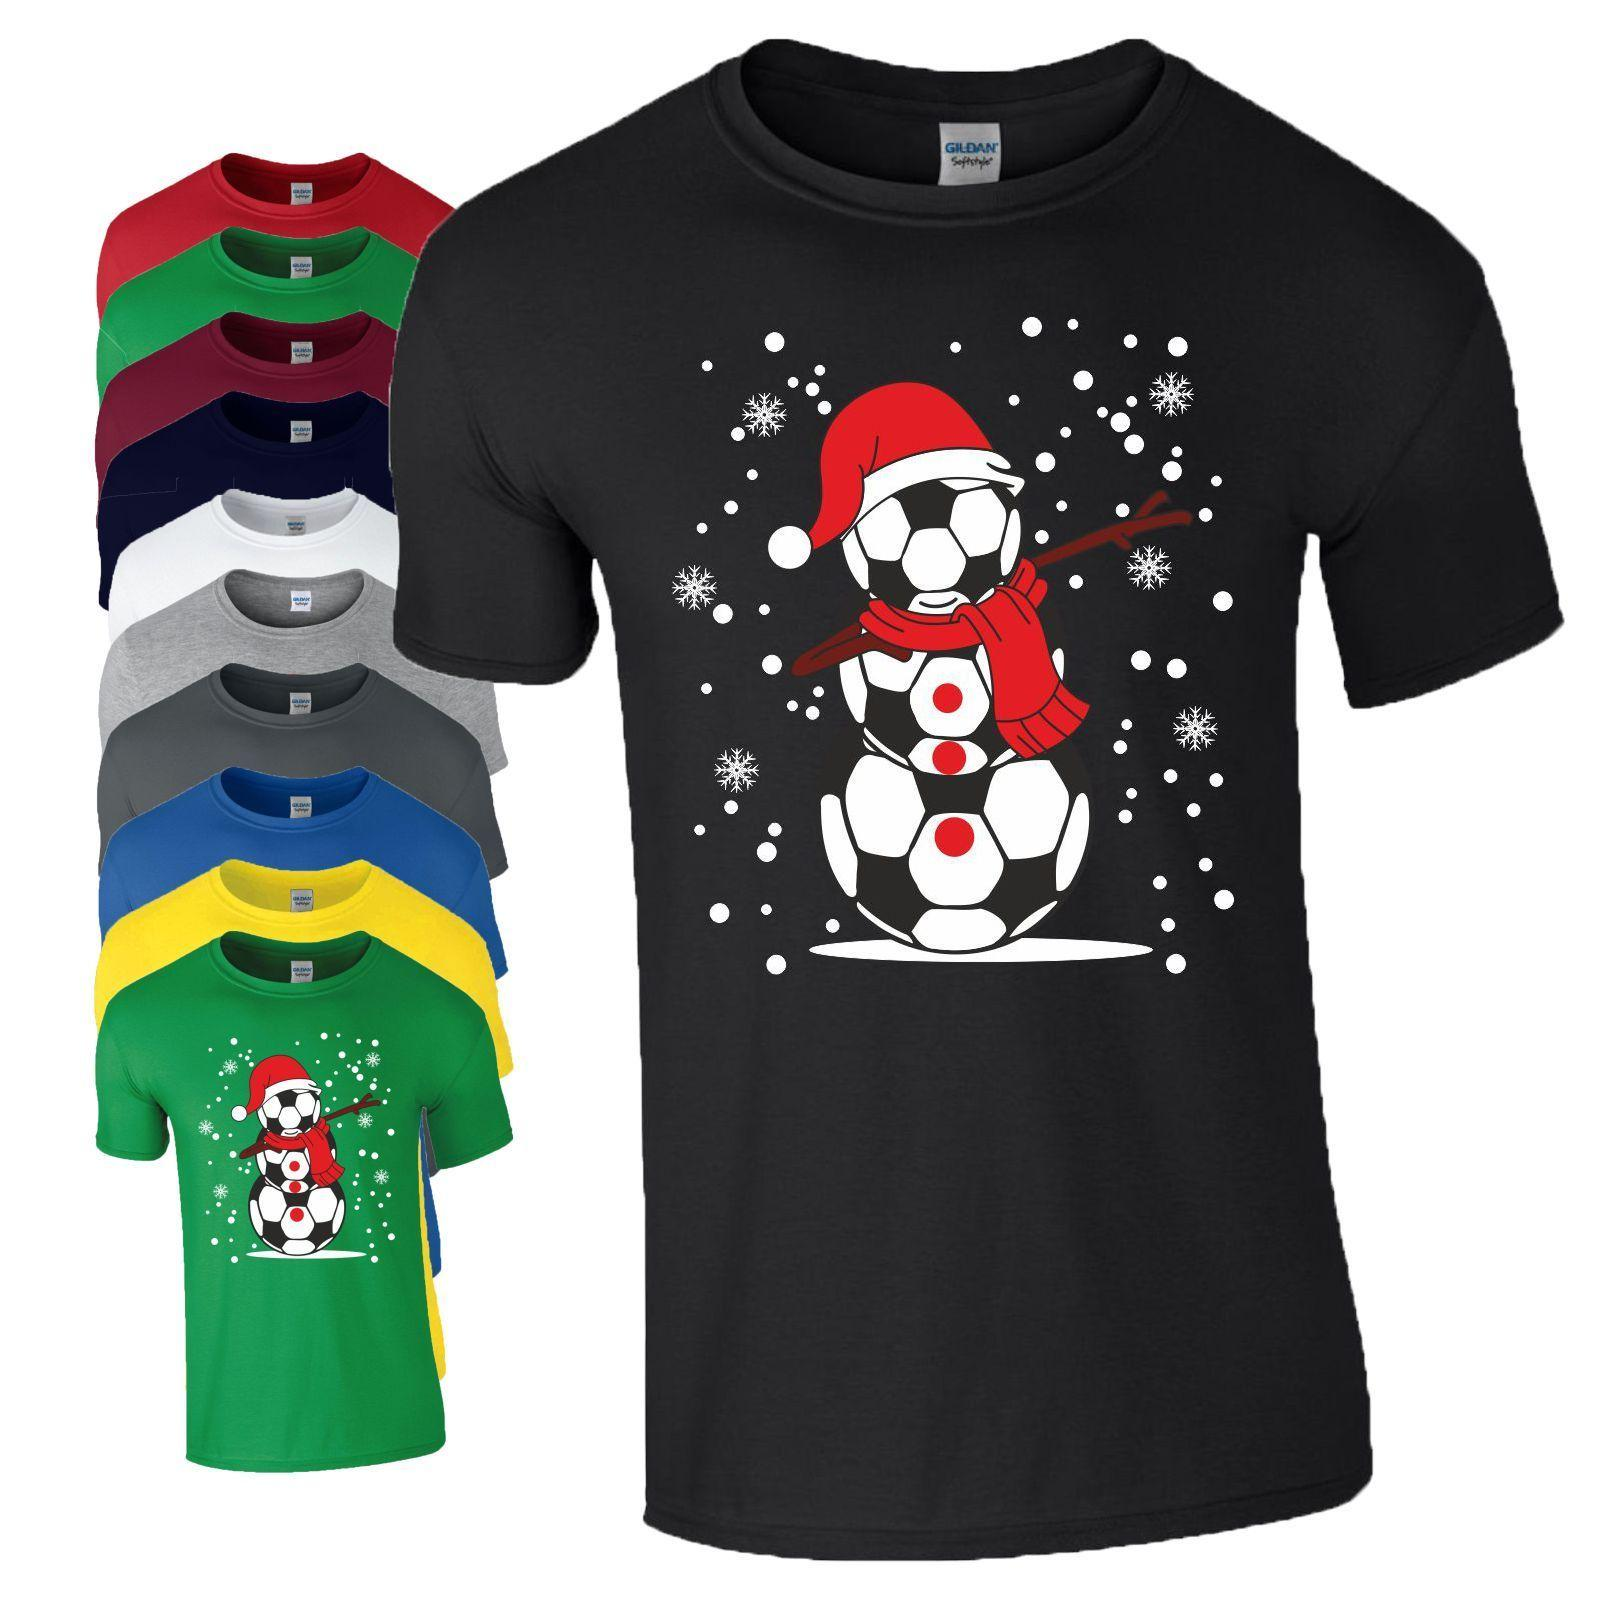 Penguin Merry Christmas Printed T Shirt Mens Boys Xmas Short Sleeve Cotton Tee